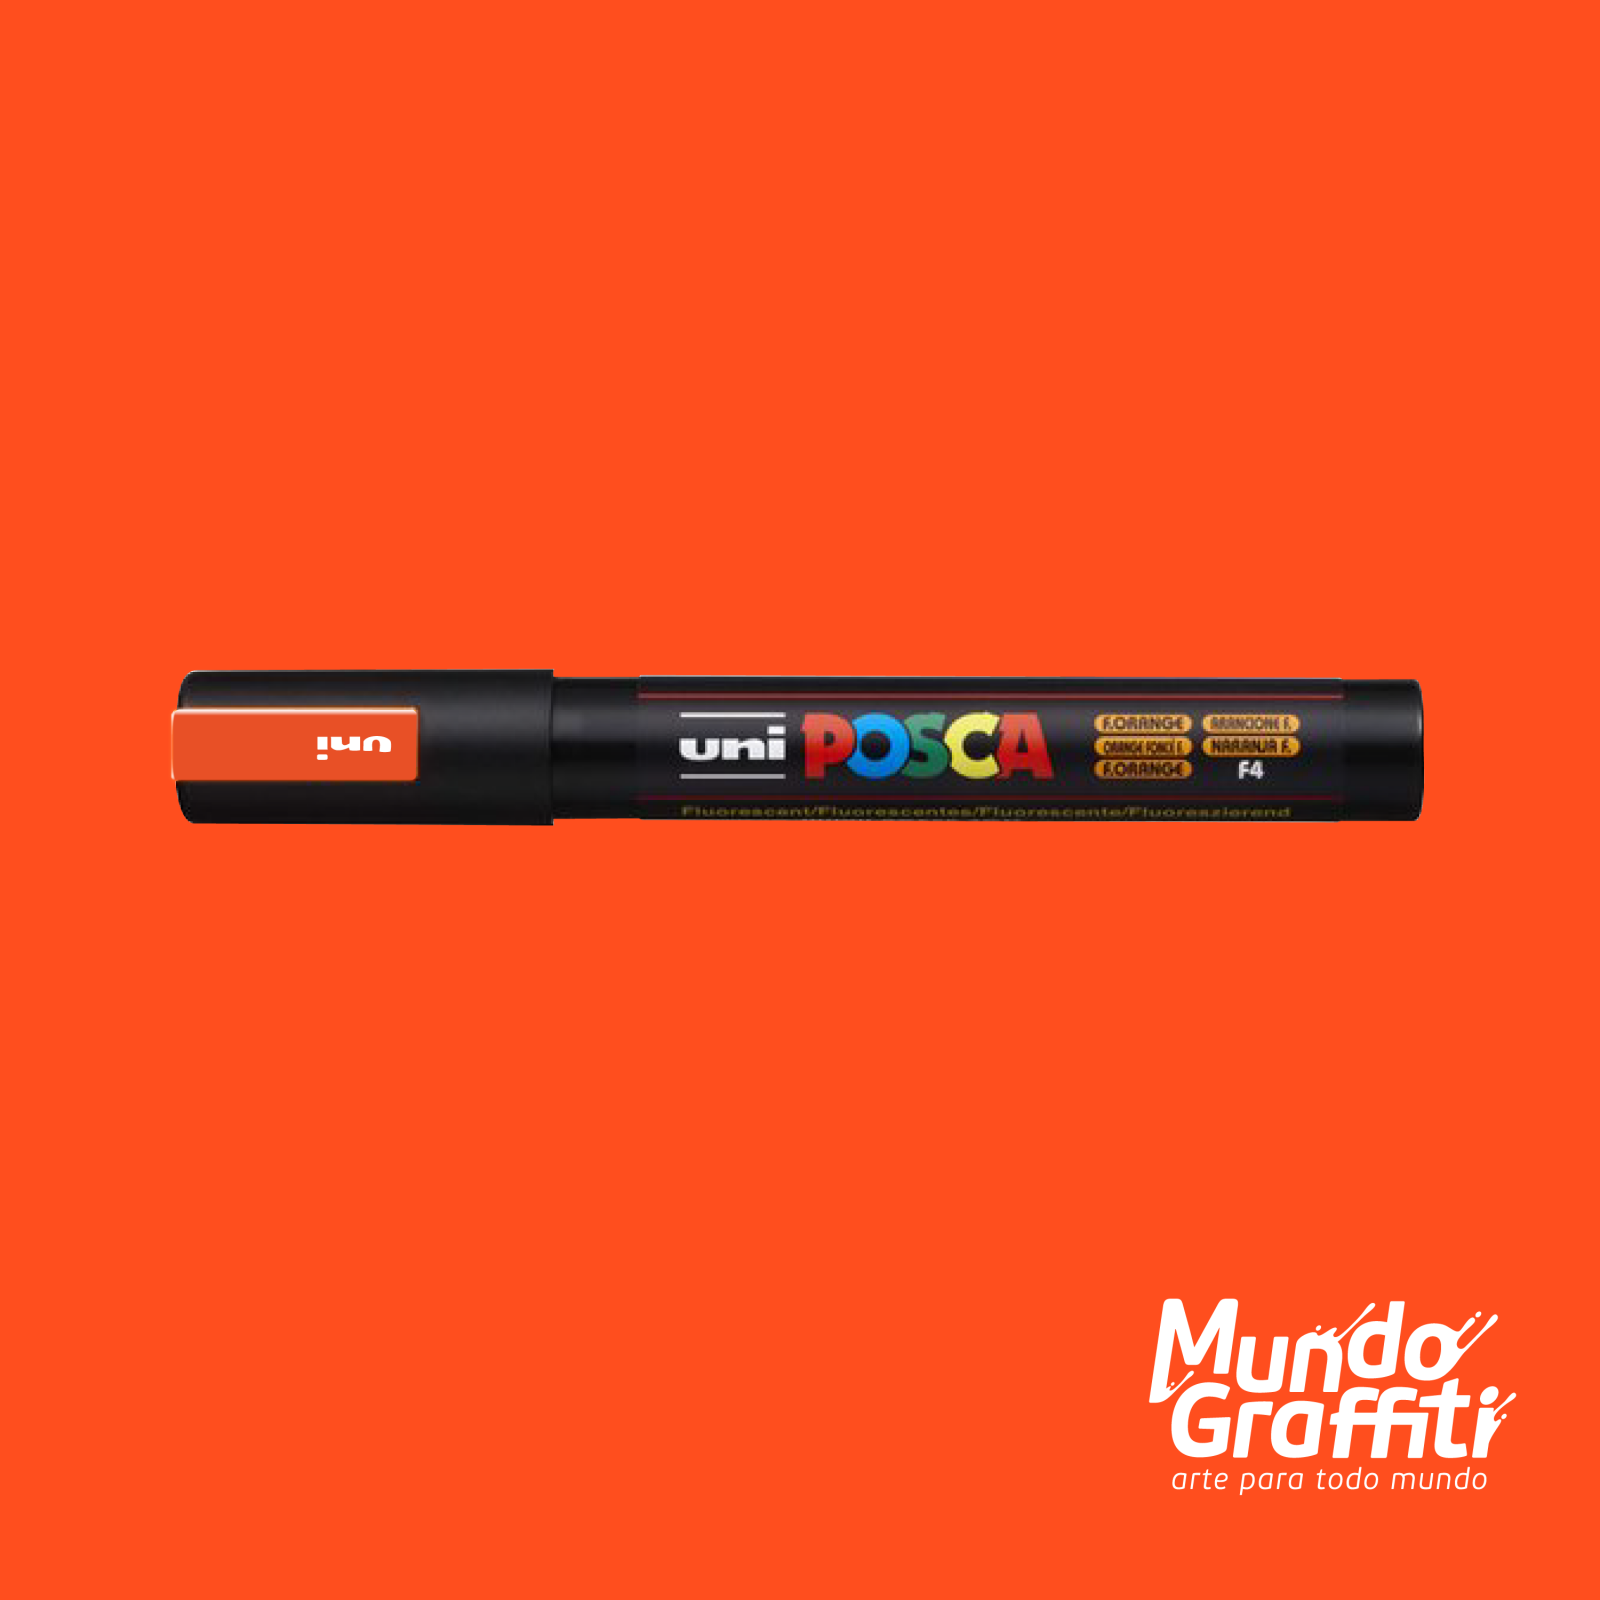 Caneta Posca 5M Fluor Laranja - Mundo Graffiti